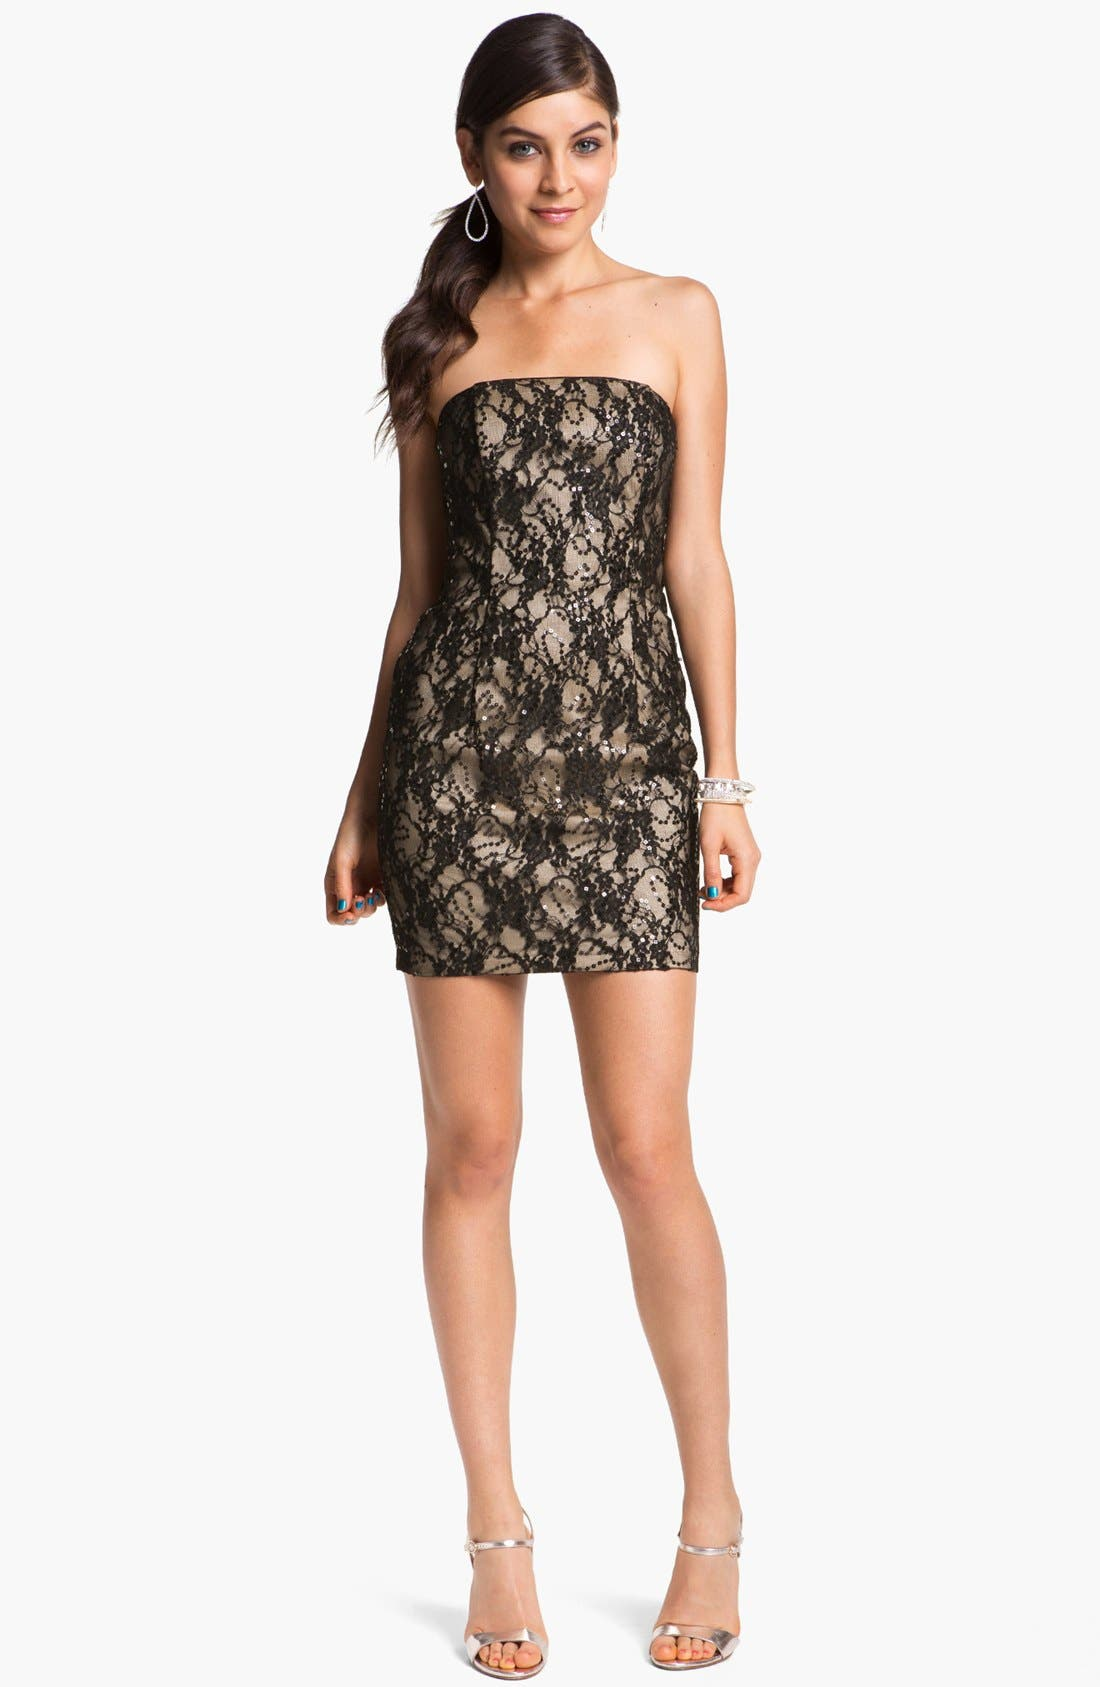 Main Image - Jessica McClintock Strapless Lace Minidress